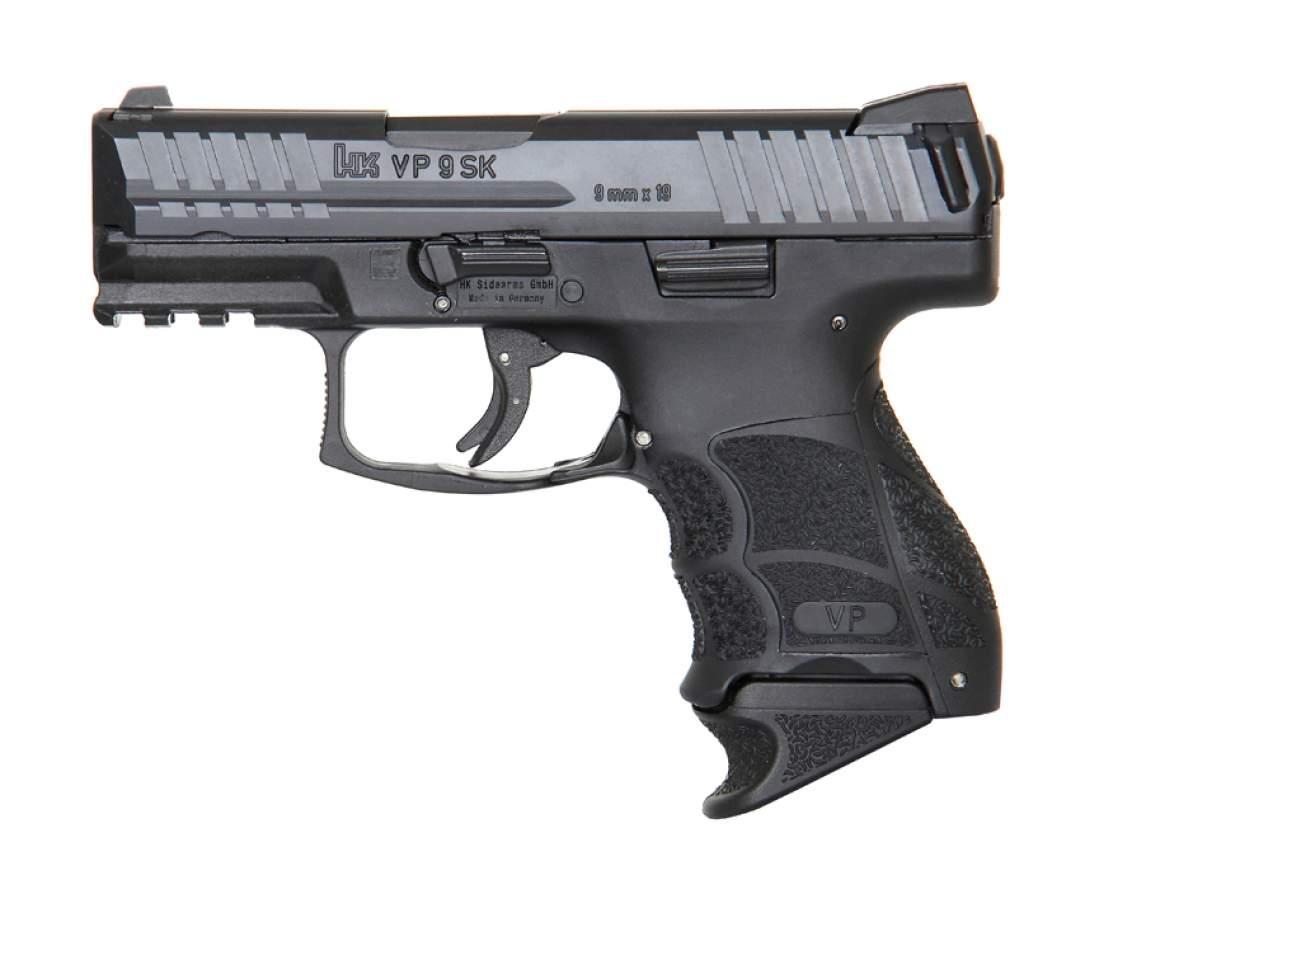 Battle Of Pistols: Can Heckler & Koch's VP9 Pistol Beat The Glock 19?